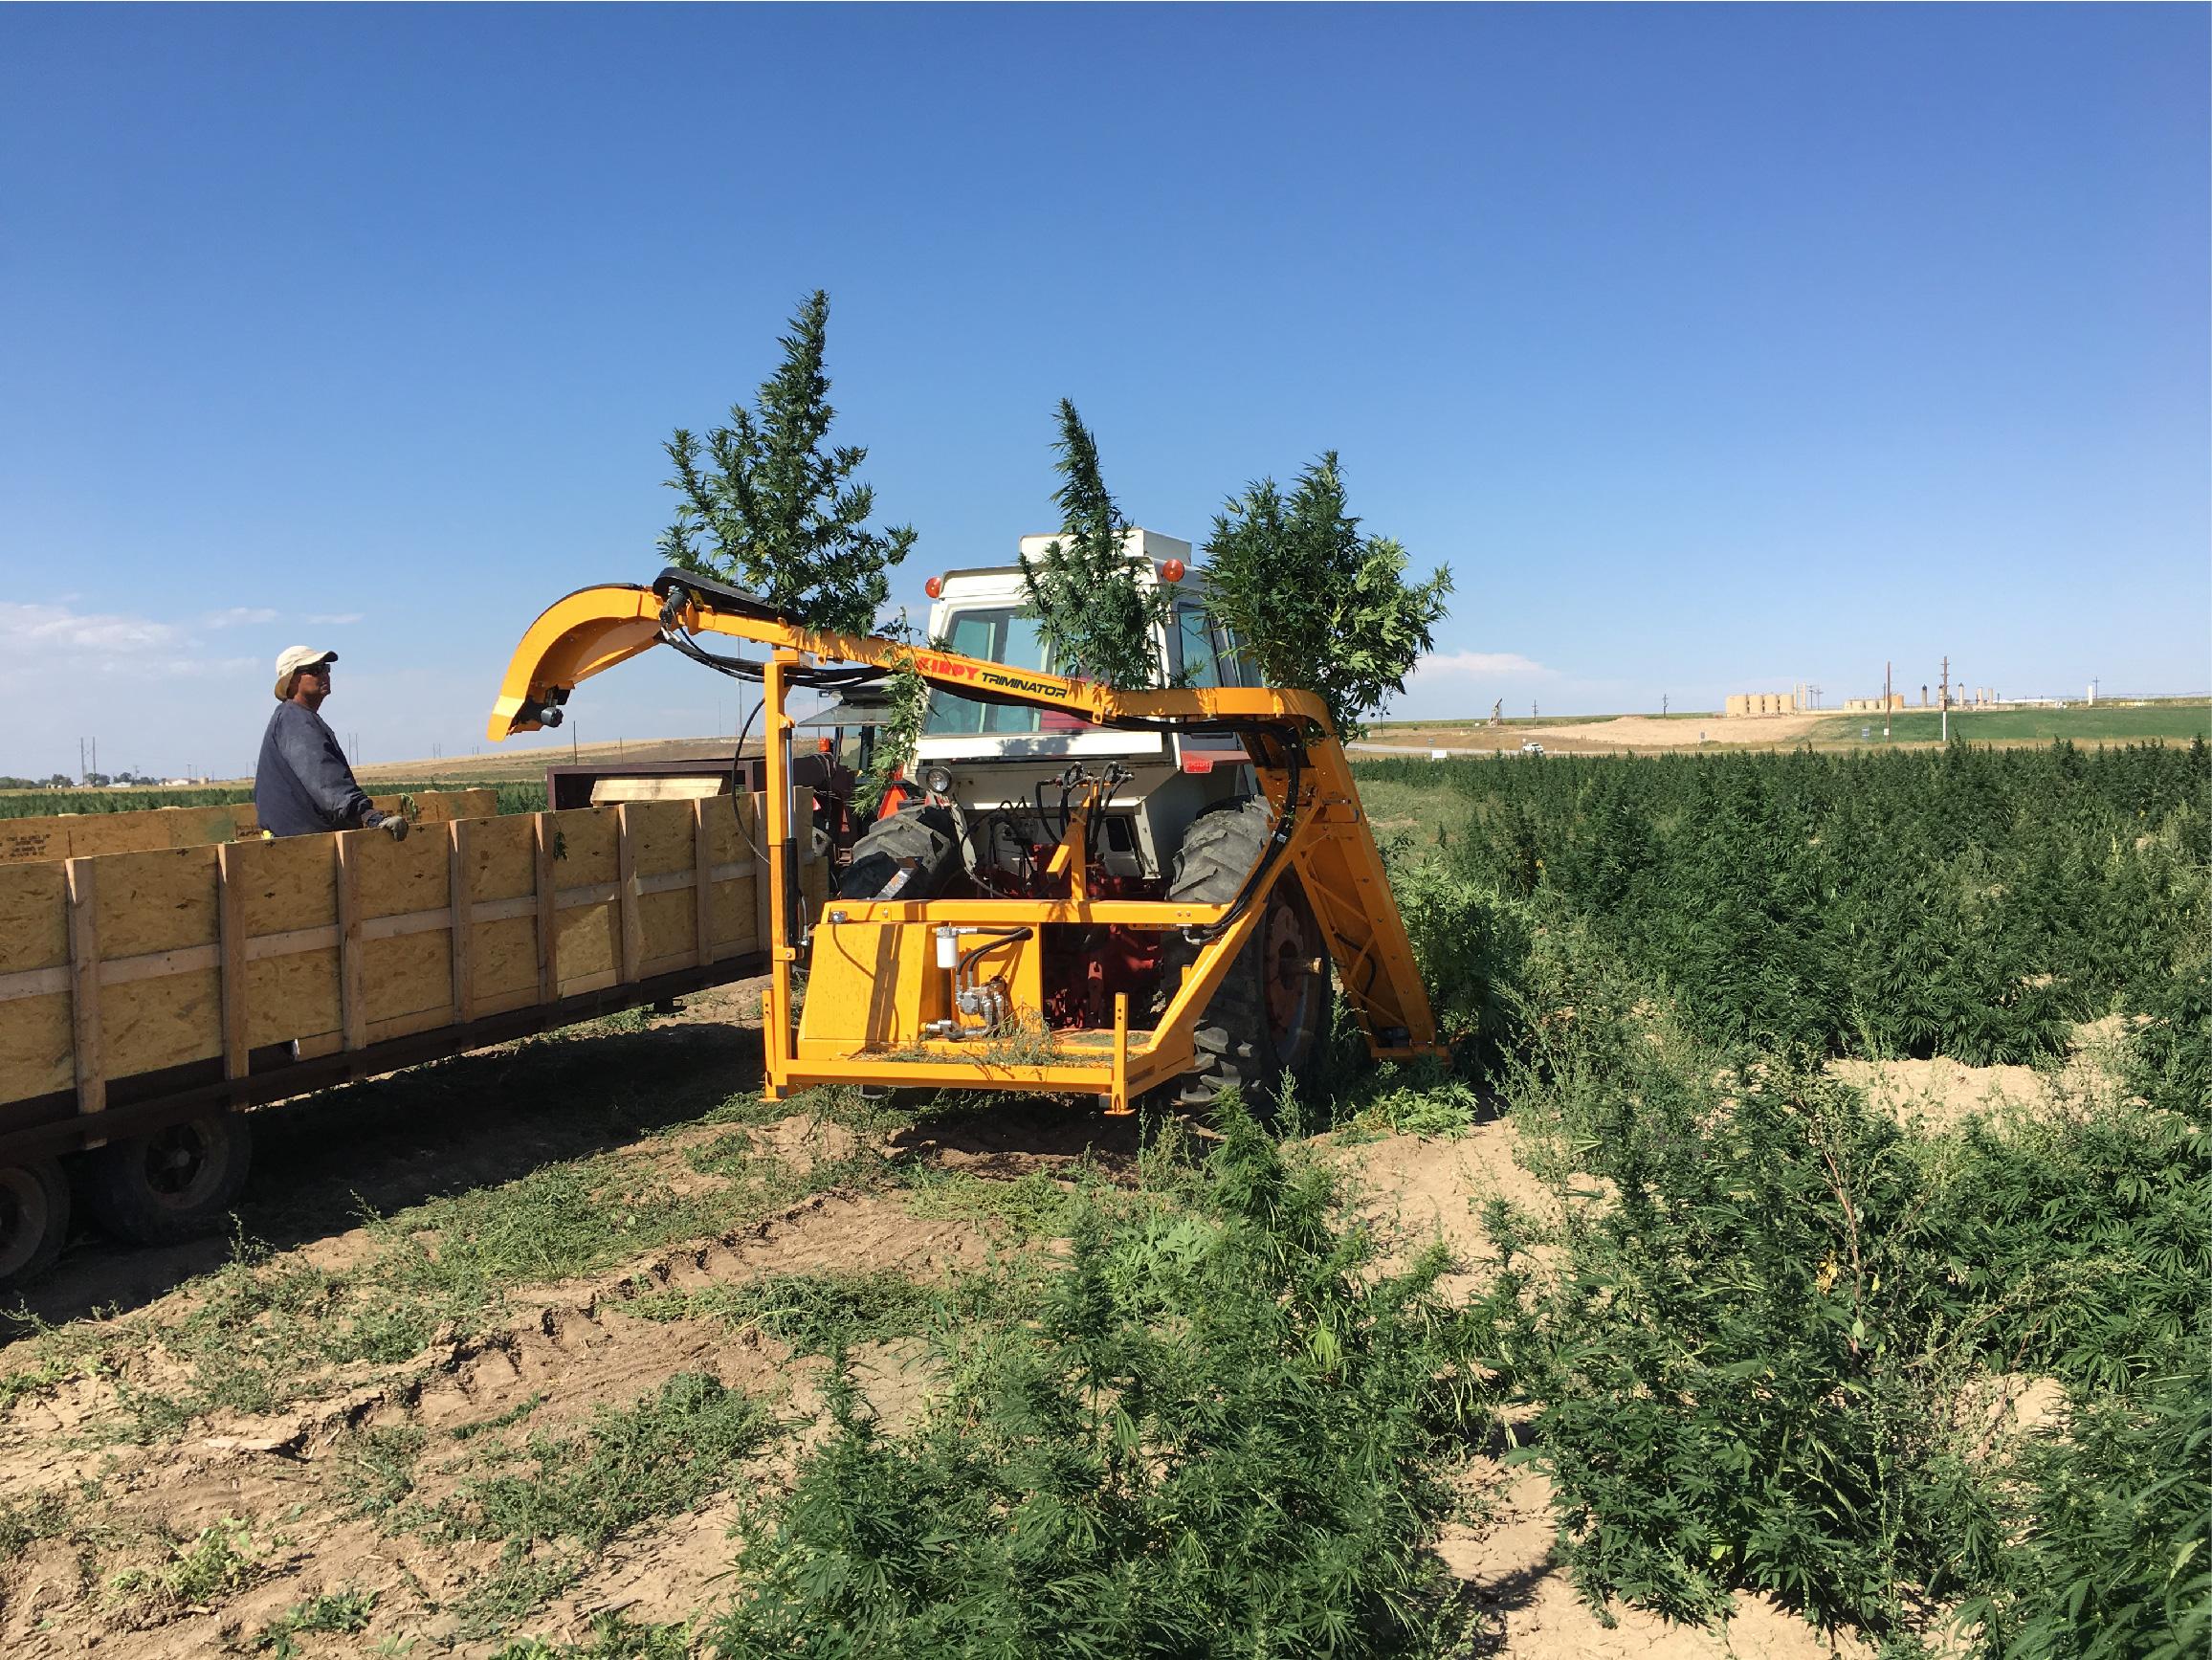 Triminator Releases a Whole-Plant CBD Hemp Harvesting